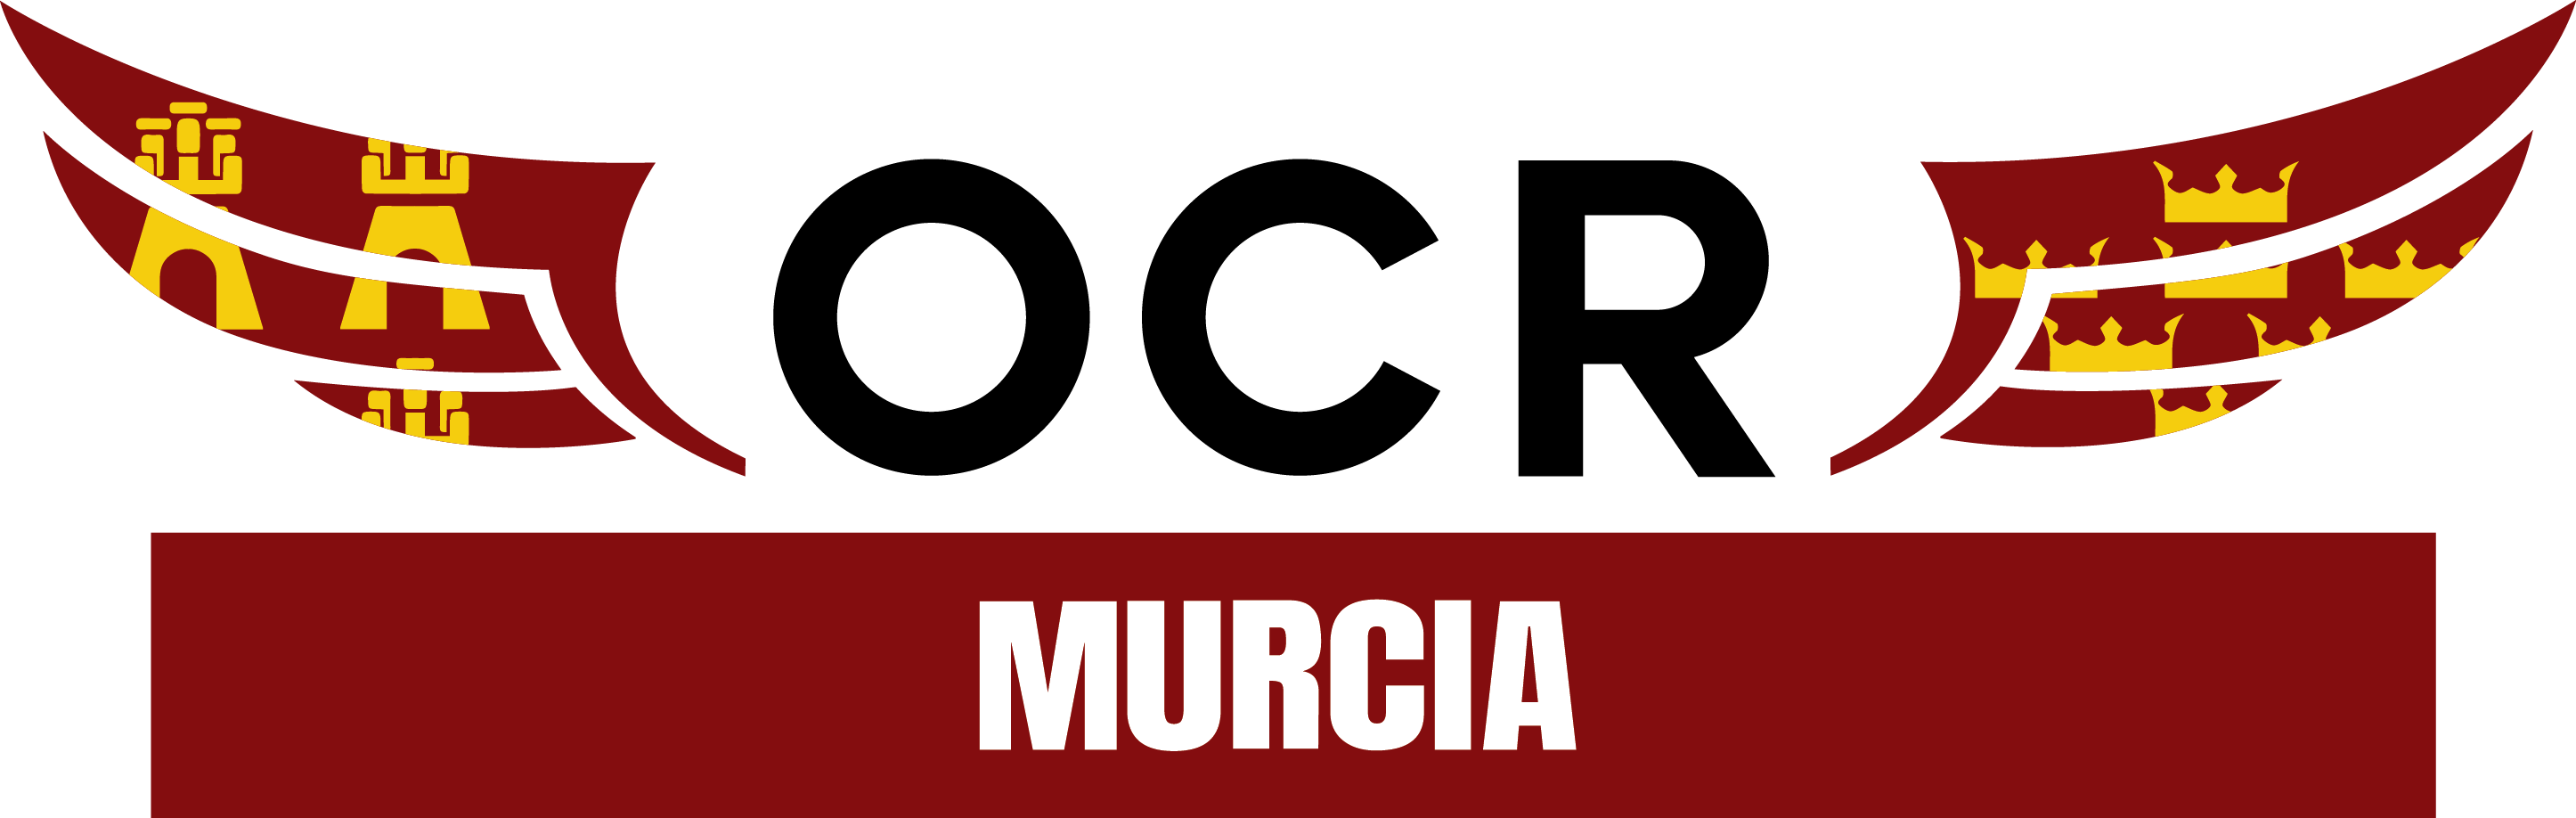 OCR Murcia